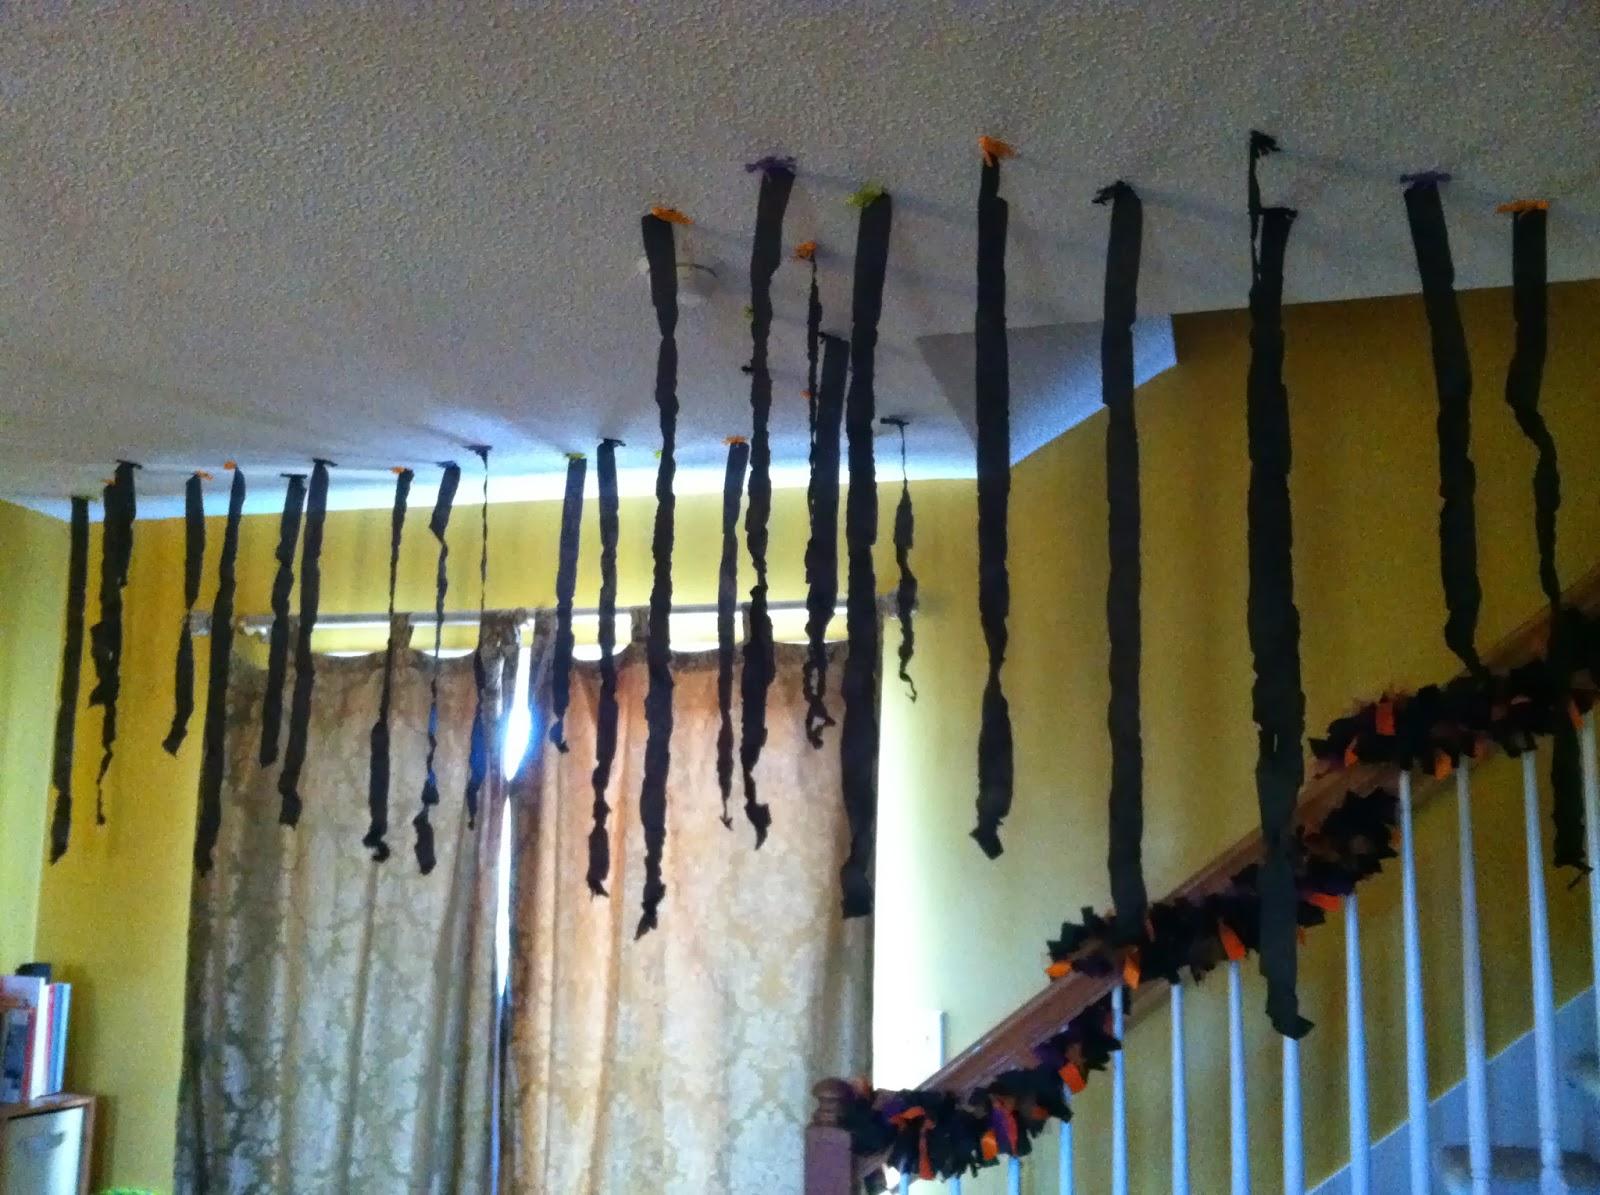 halloween decorating diy spooky ceiling streamers - Halloween Ceiling Decorations